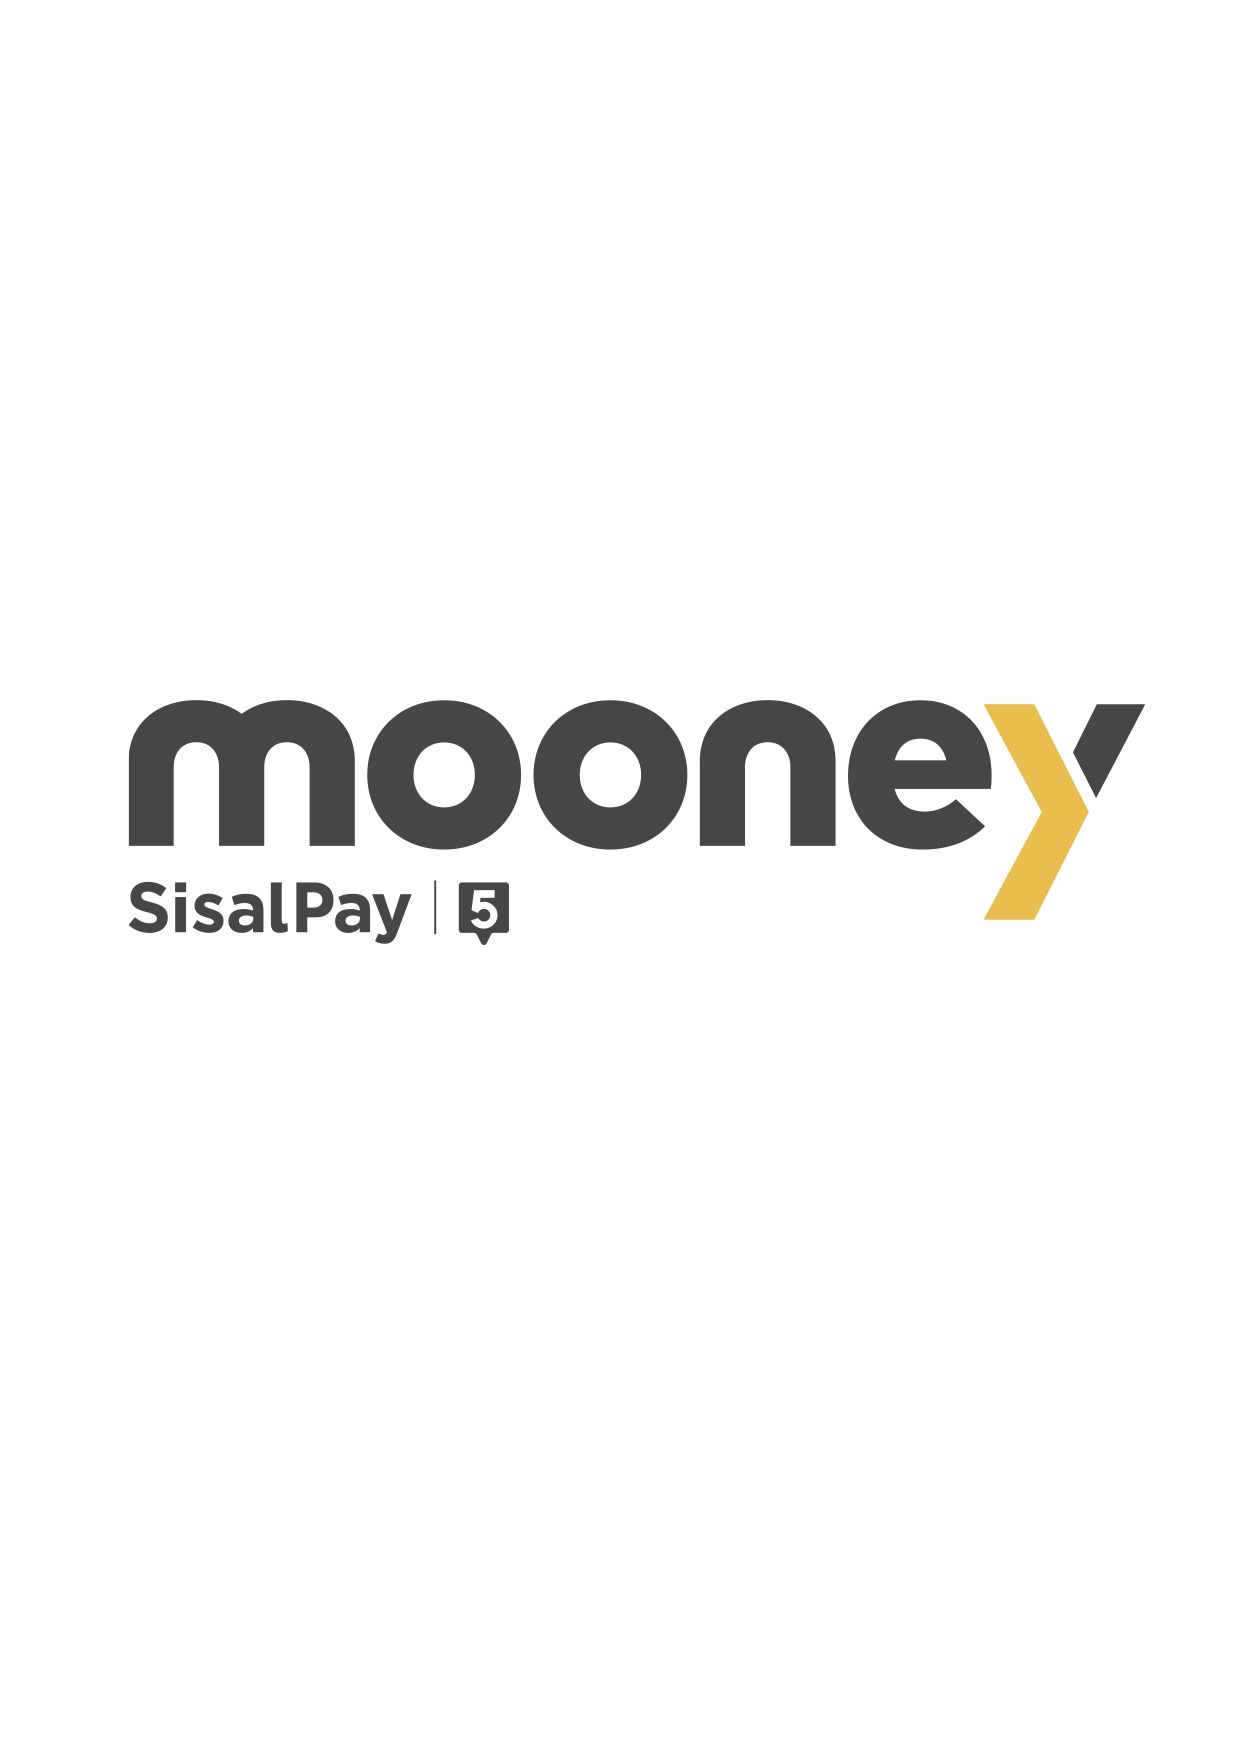 #ILCLIENTE Mooney | SisalPay5 Logo